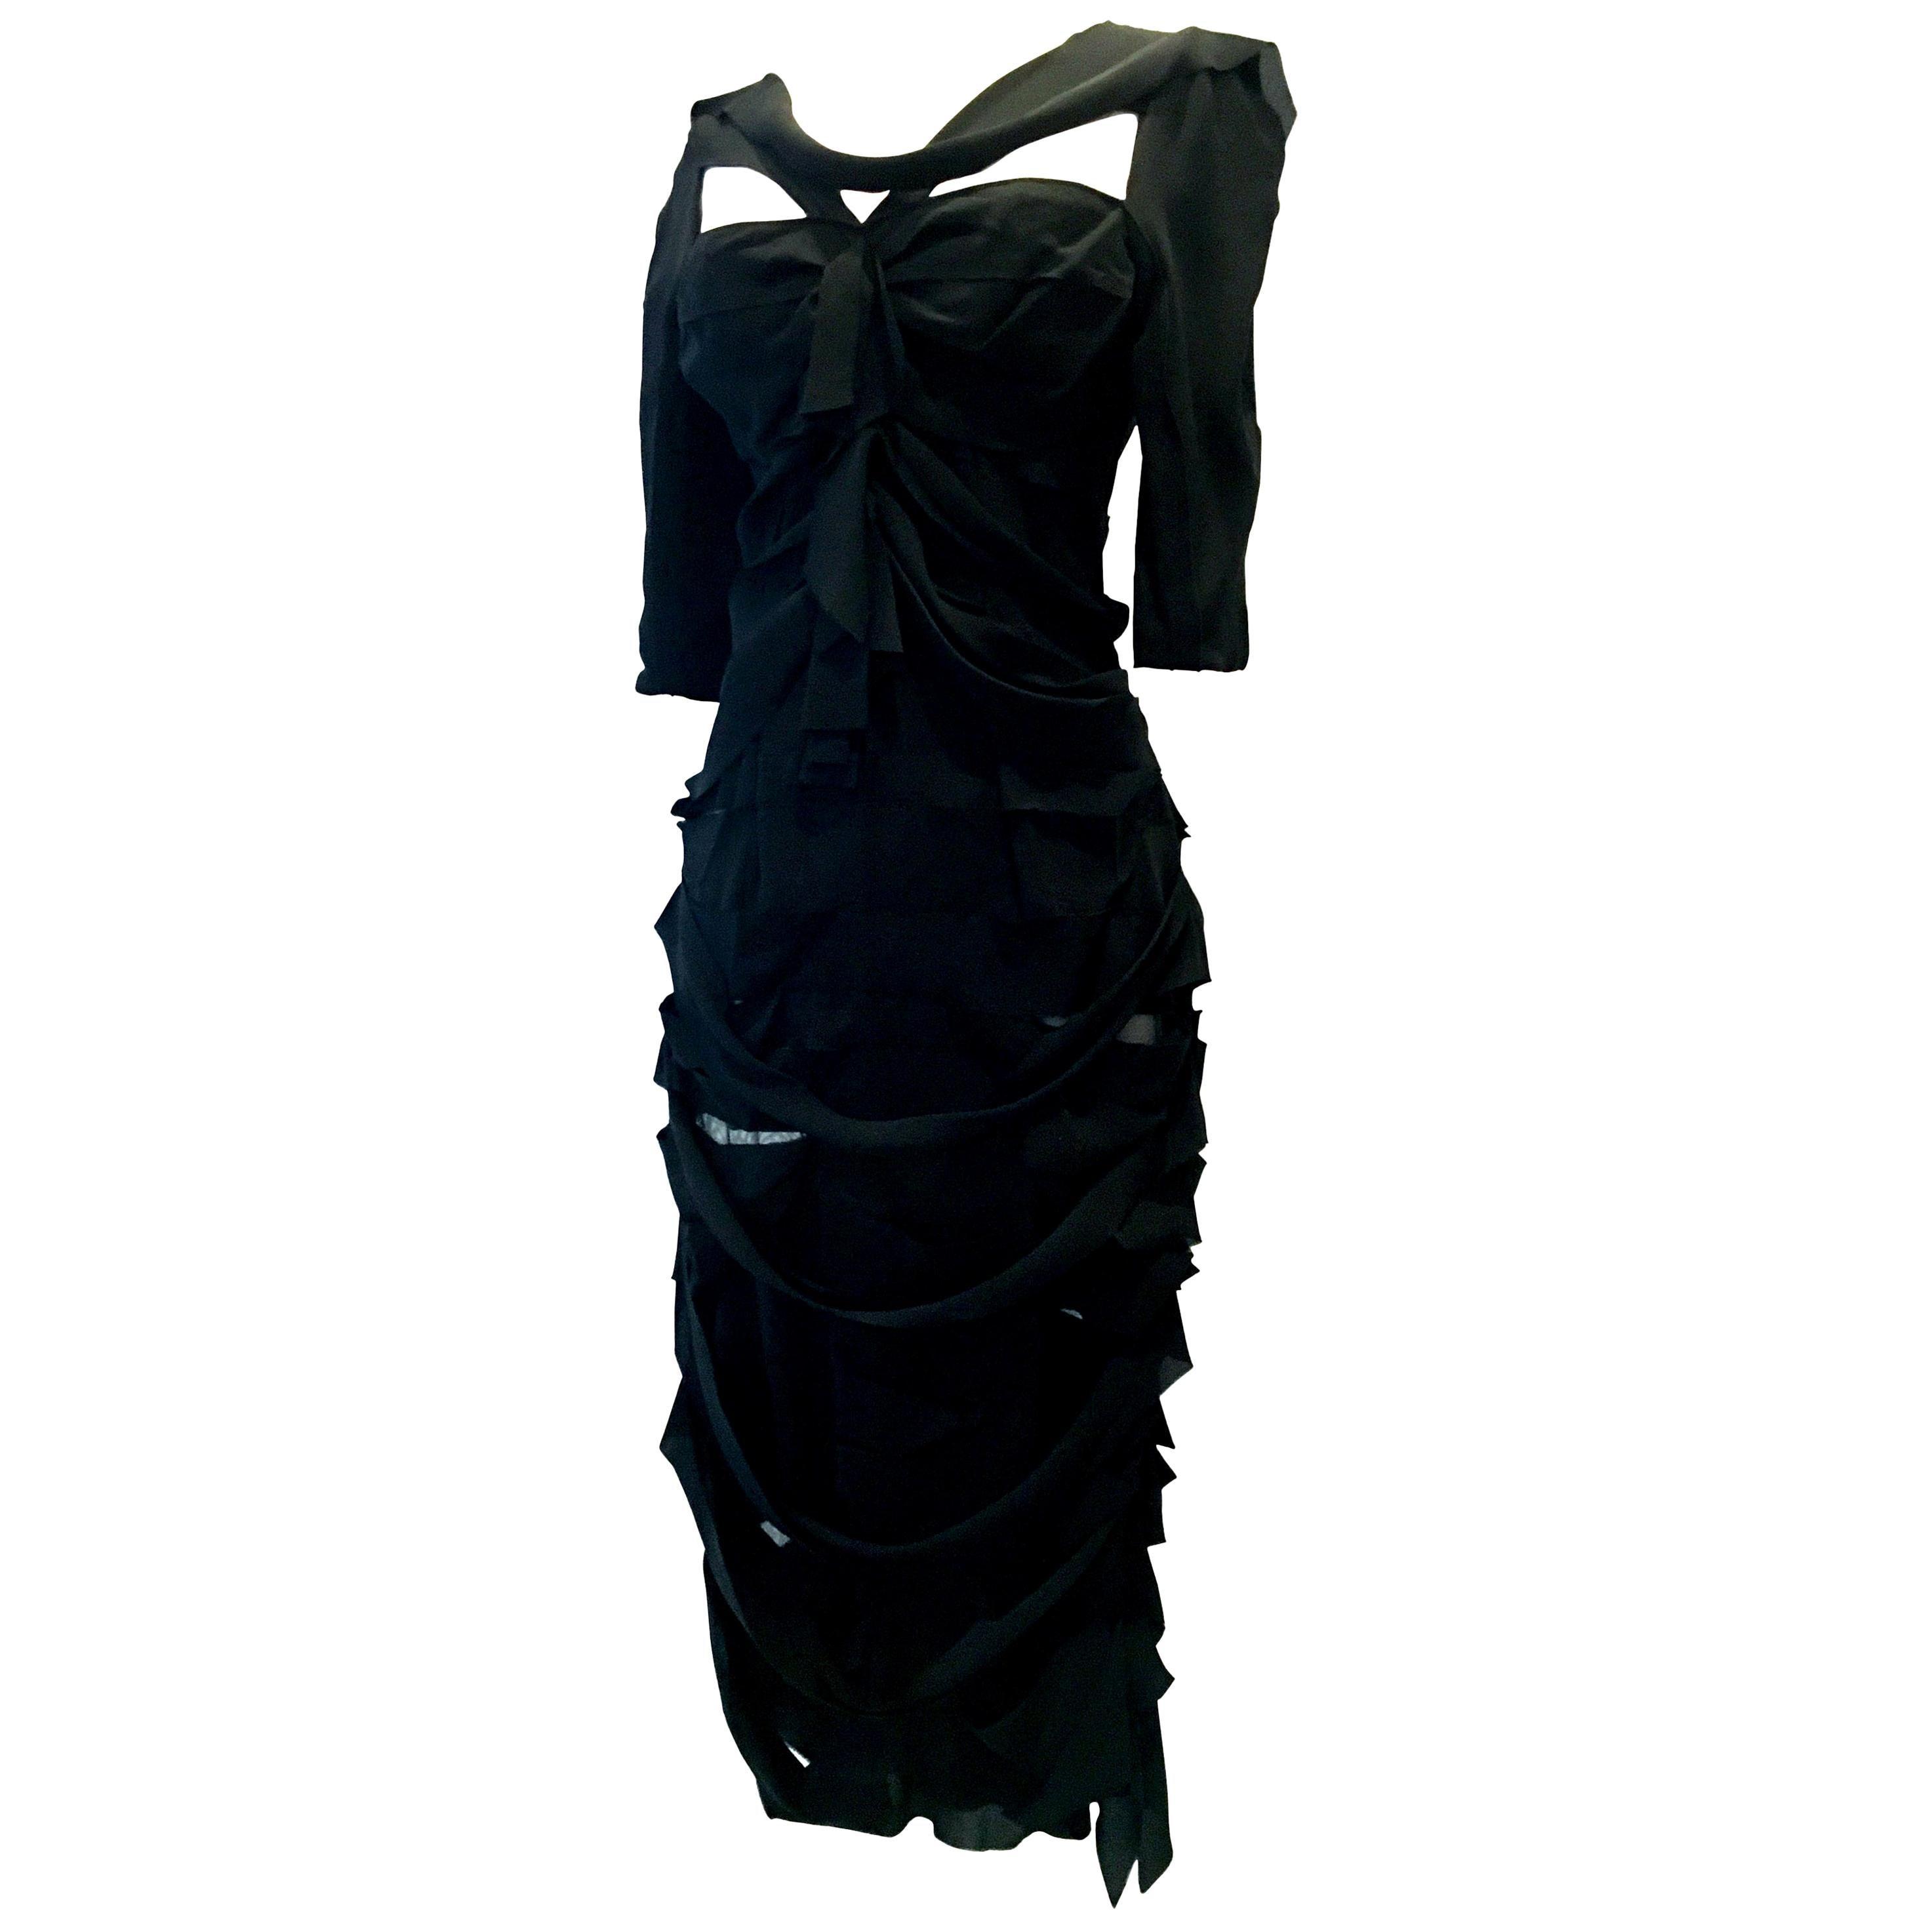 21st Century & New Black Silk Dress By, Nina Ricci Paris